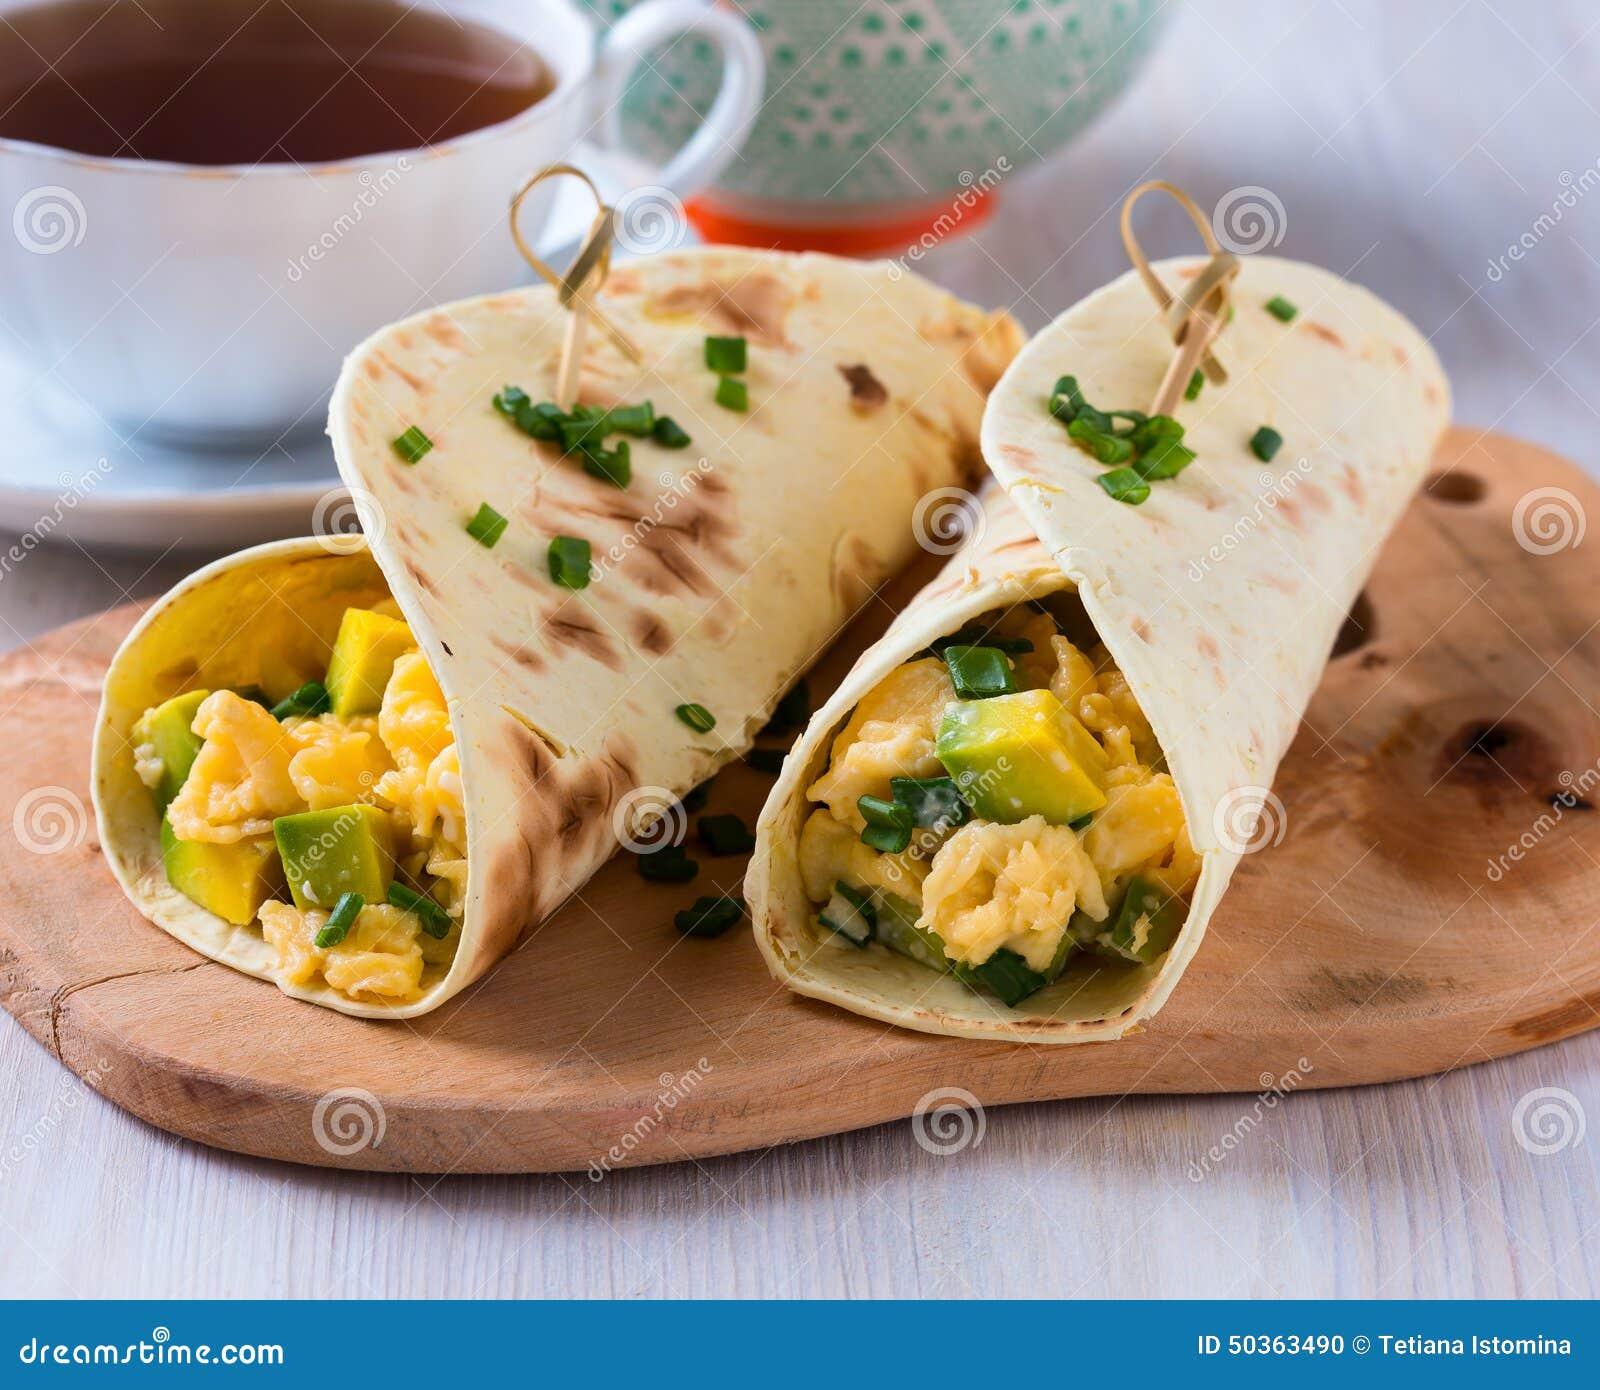 Homemade avocado scrambled egg wraps for healthy breakfast.